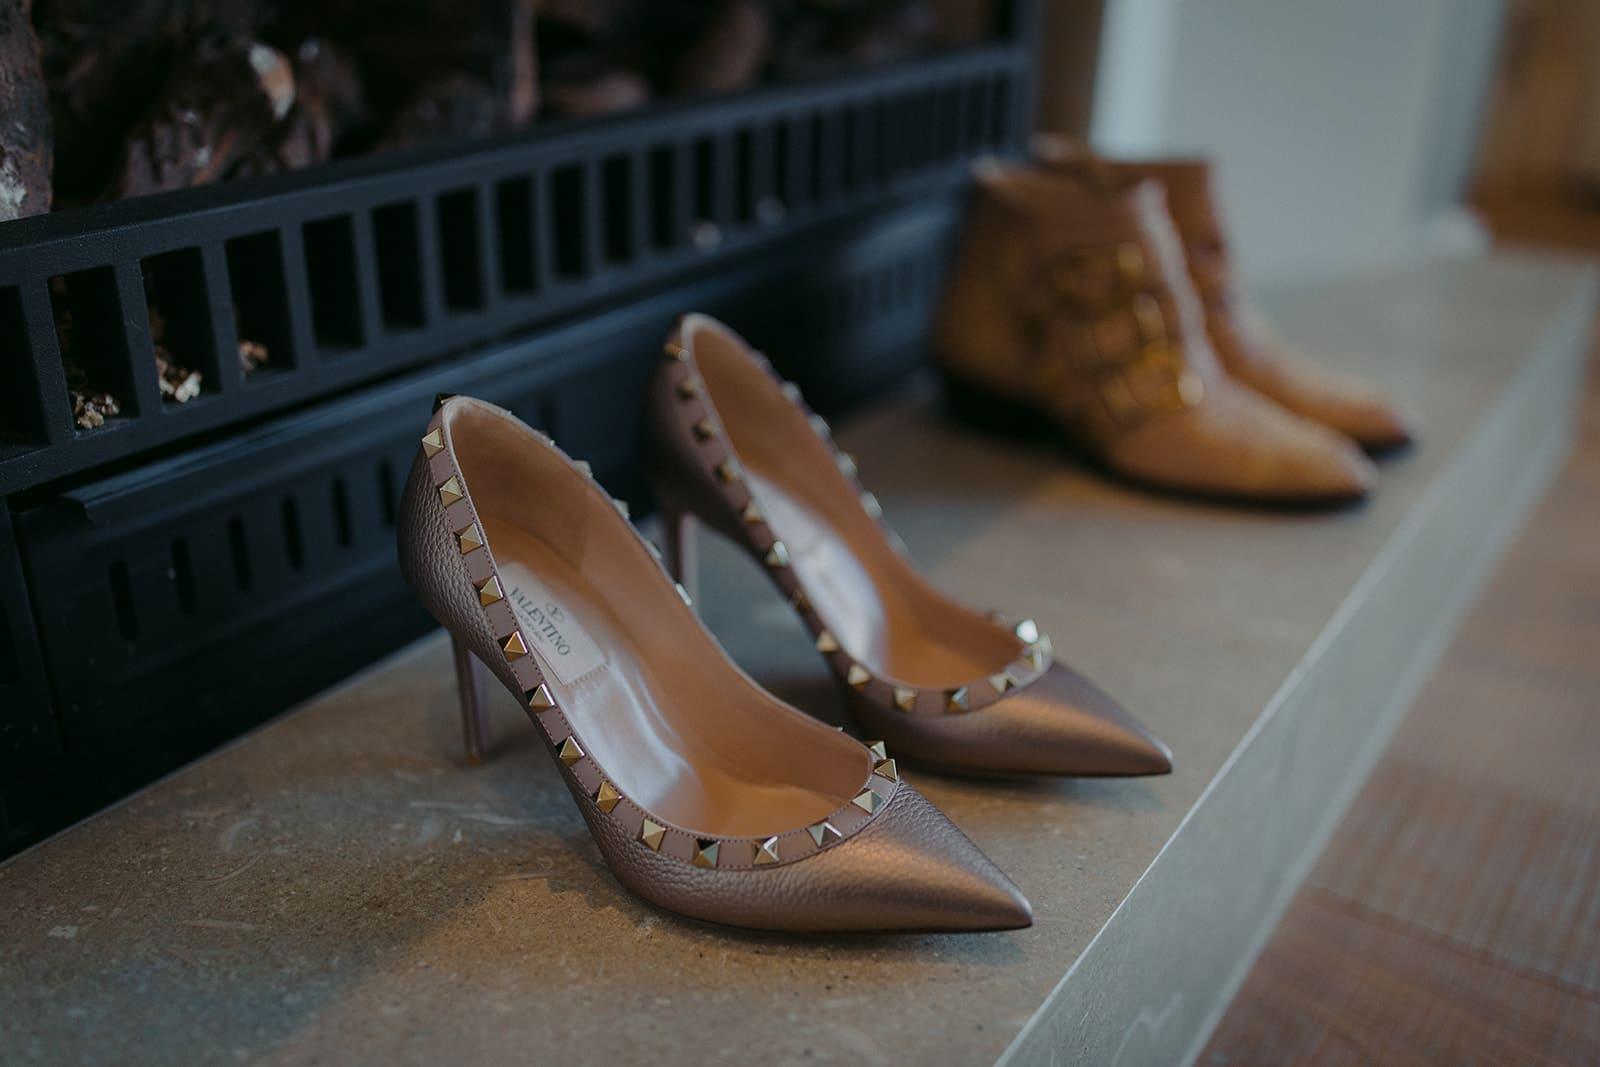 Real Weddings | Vinka Design | Real Brides Wearing Vinka Gowns | Sara and Ben - wedding shoes close up